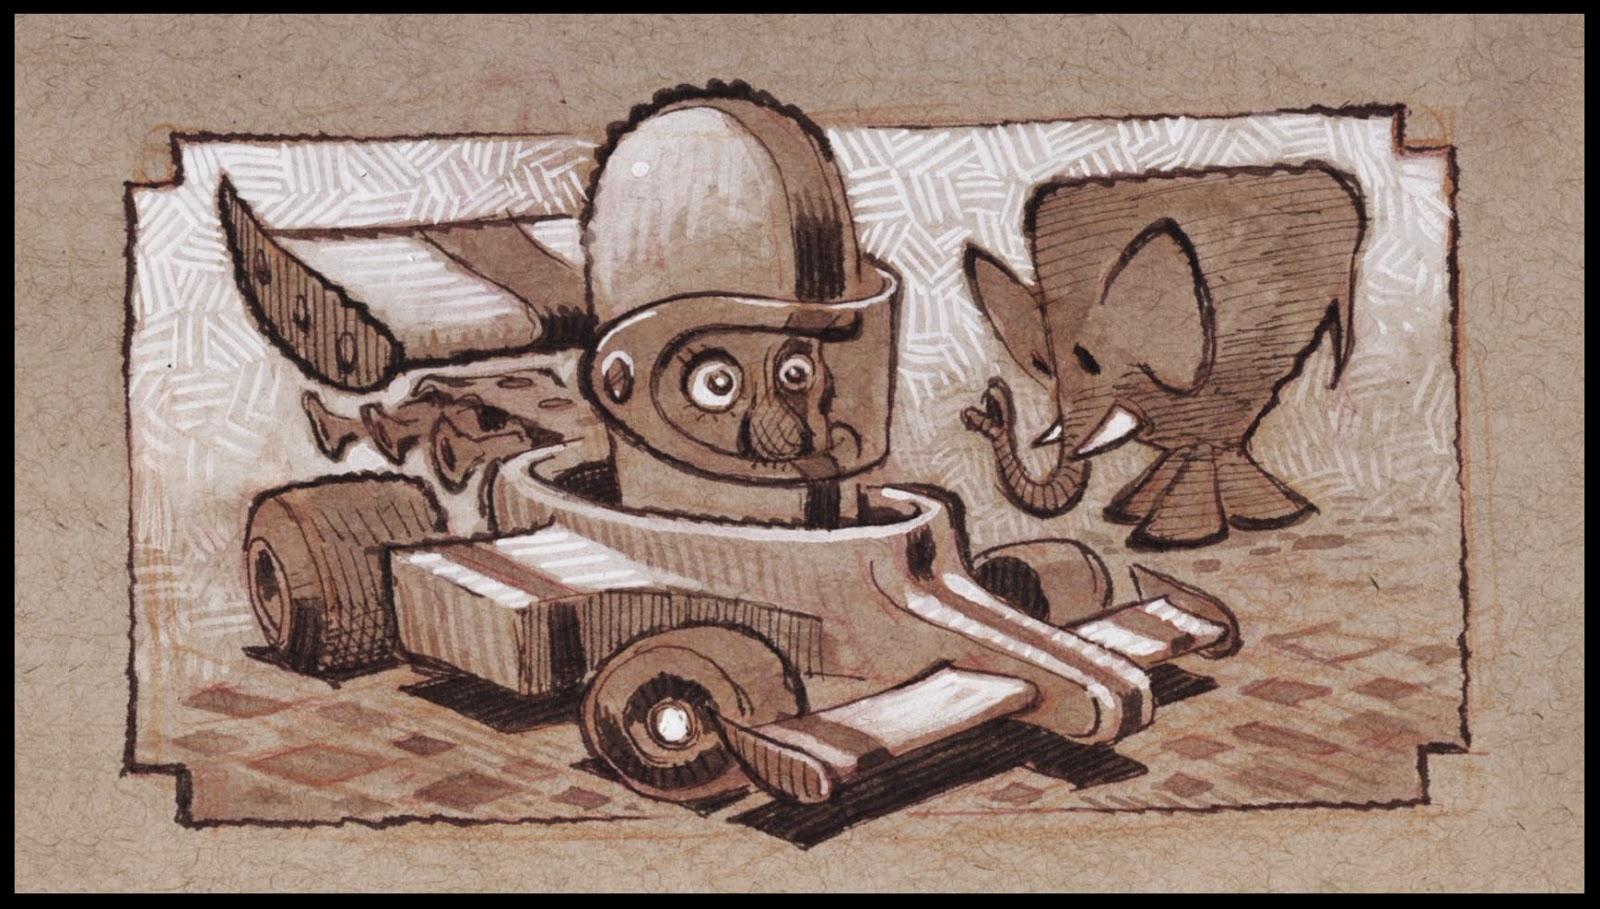 F1.ElephantHuge.jpg